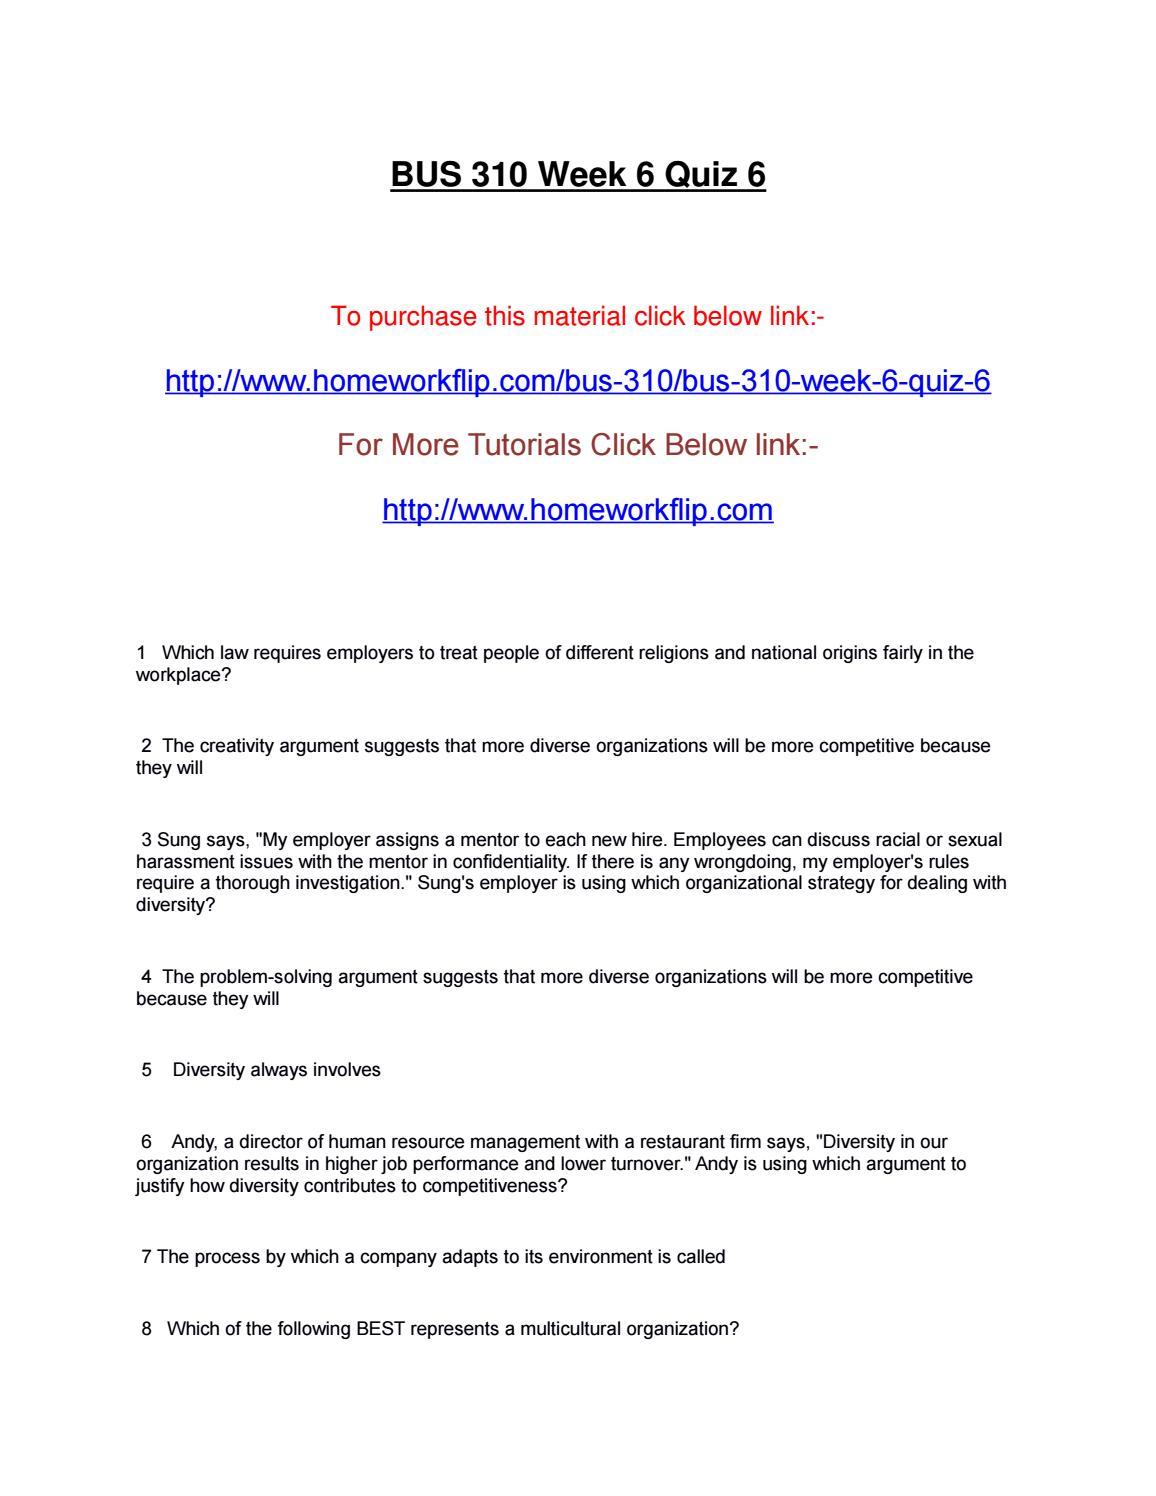 Bus 310 Week 6 Quiz 6 By Homeworkflip Book Issuu